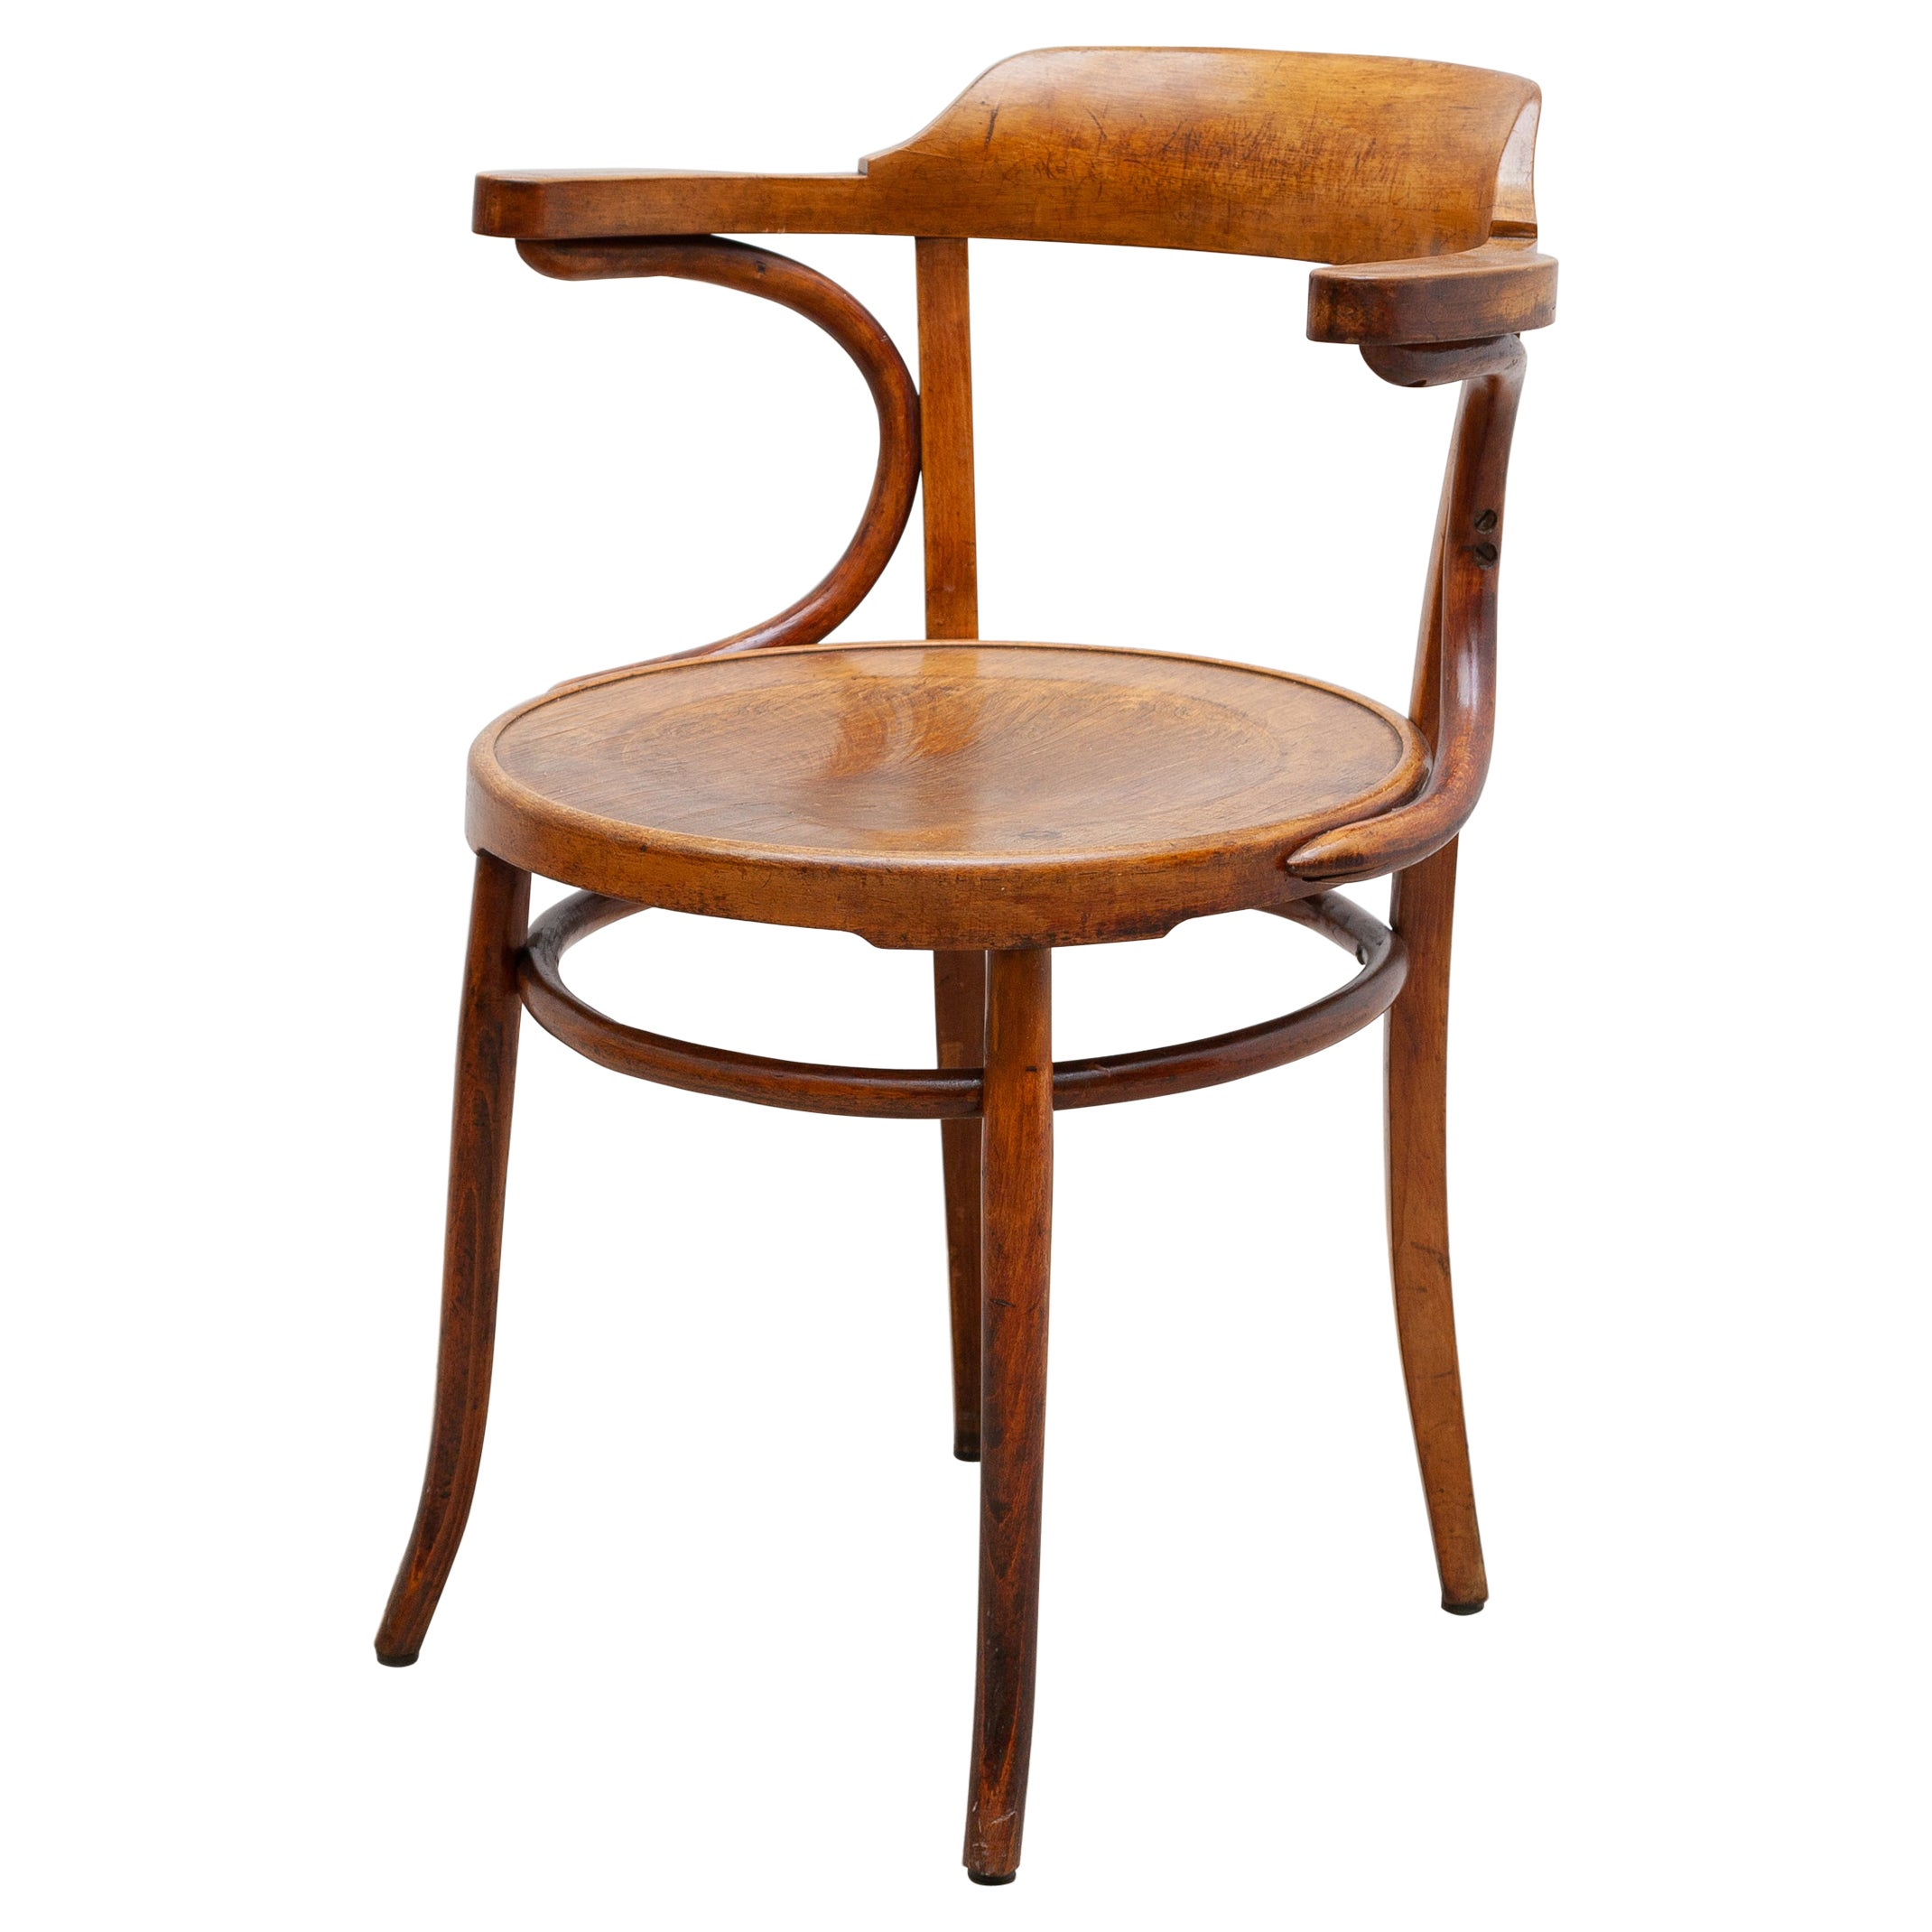 Iconic Thonet Chair Designed by Gebrüder Thonet Company